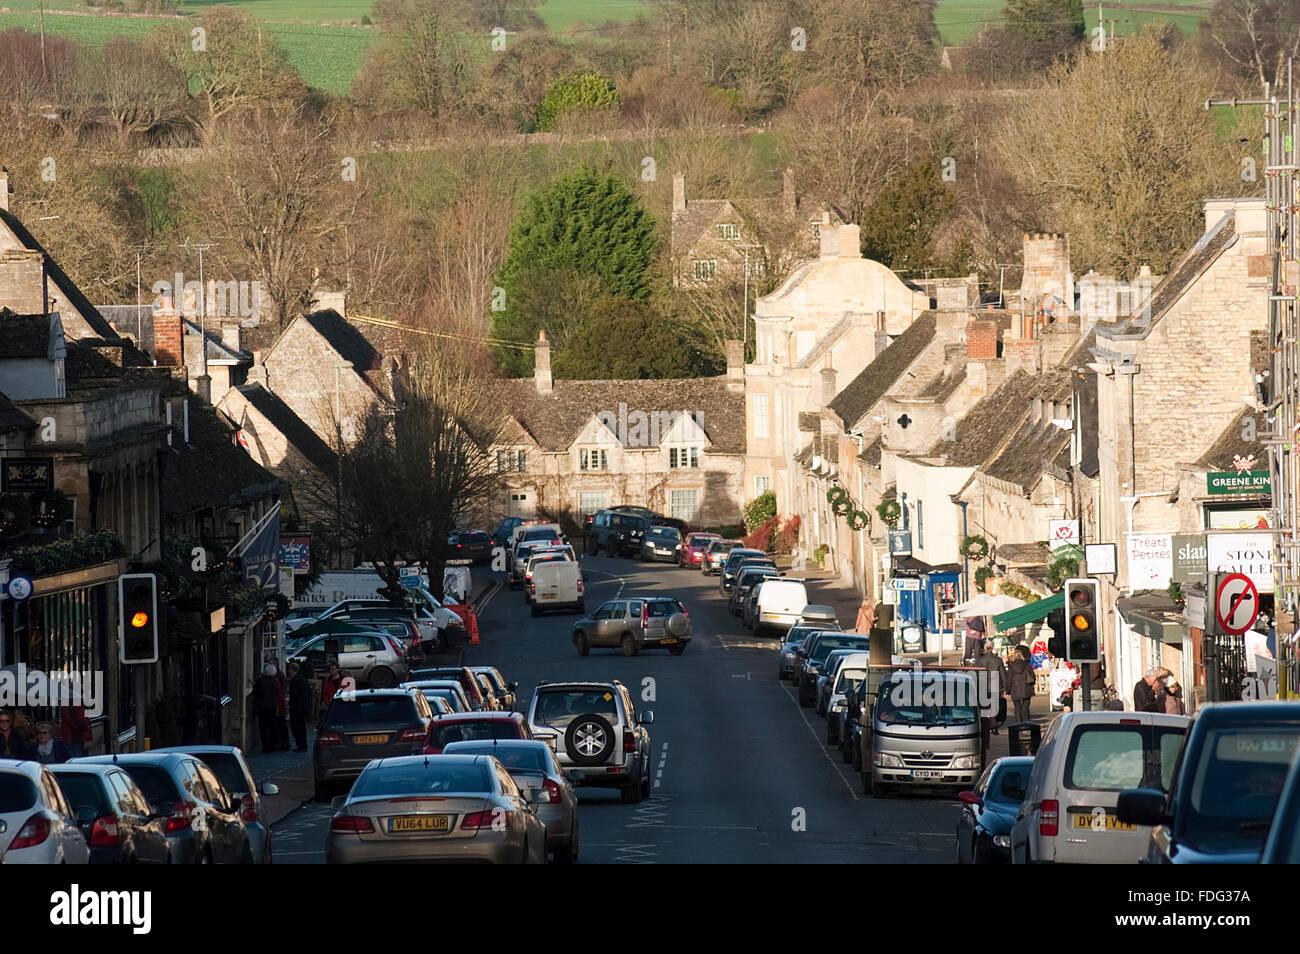 Burford High Street - Stock Image